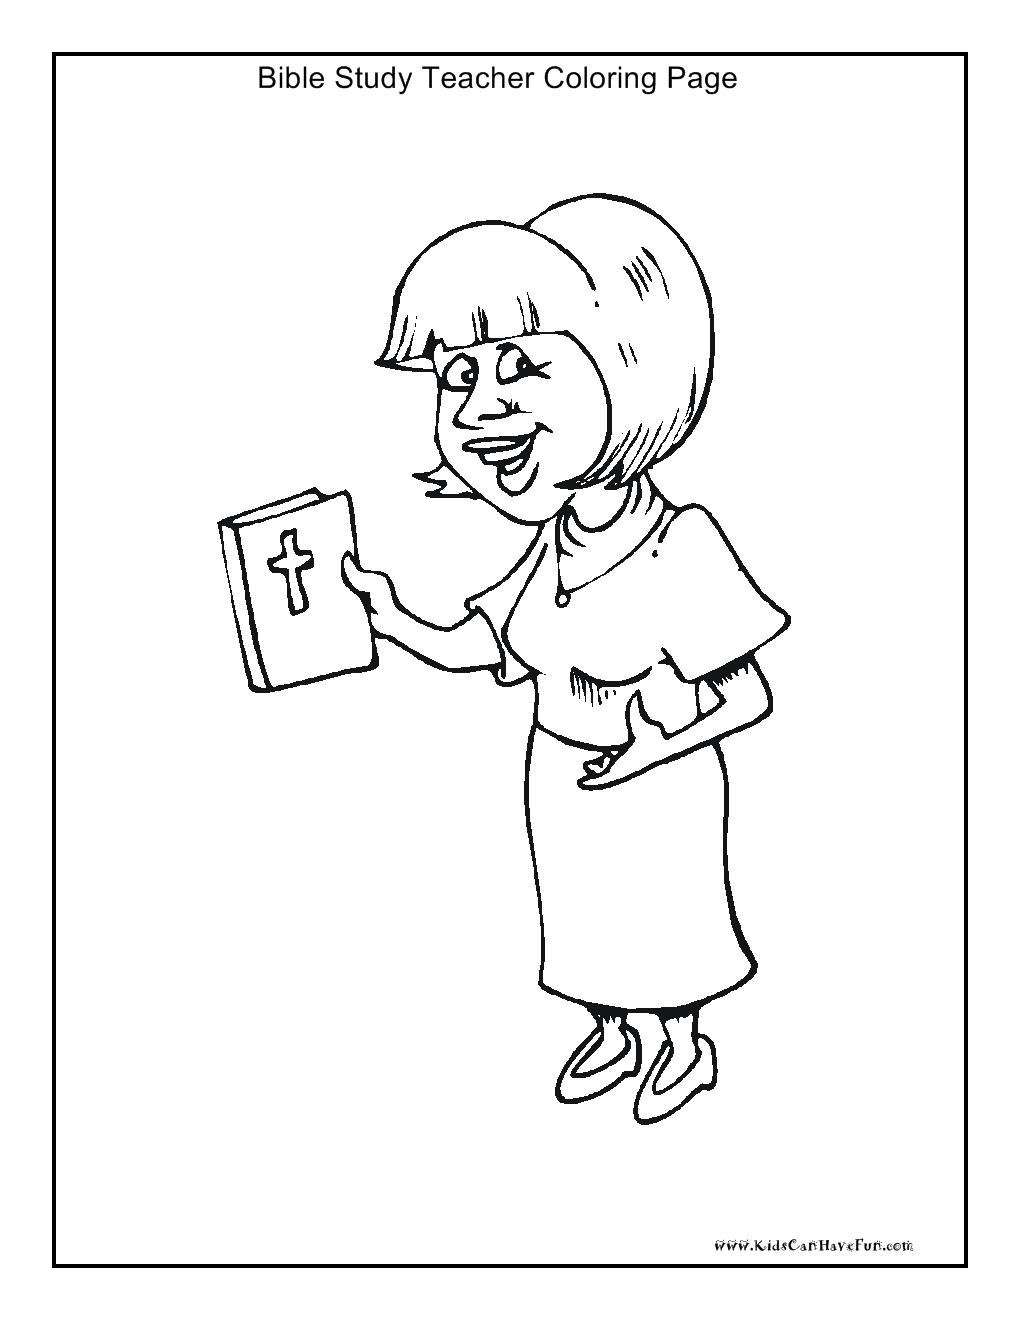 Bible study teacher coloring page http://www.kidscanhavefun.com ...